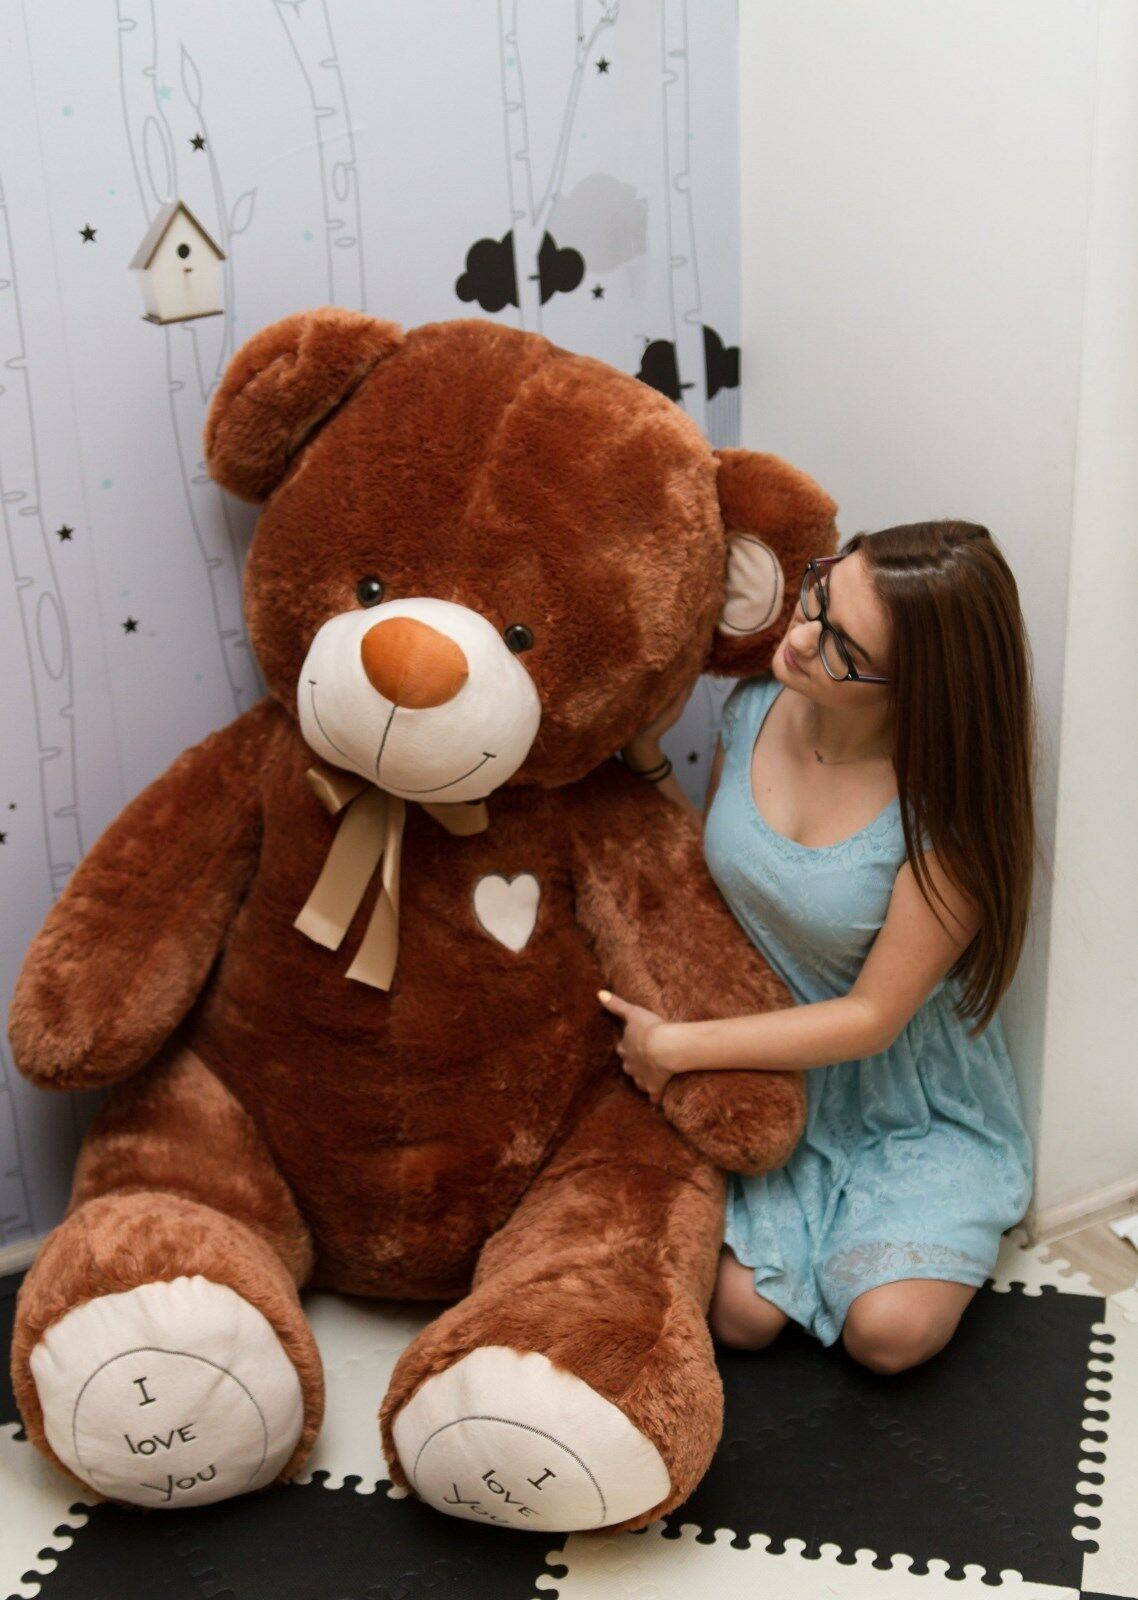 190 cm     GIANT TEDDY BEAR LARGE BIG HUGE STUFFED  Braun CHRISTMAS GIFT 4f4ee4